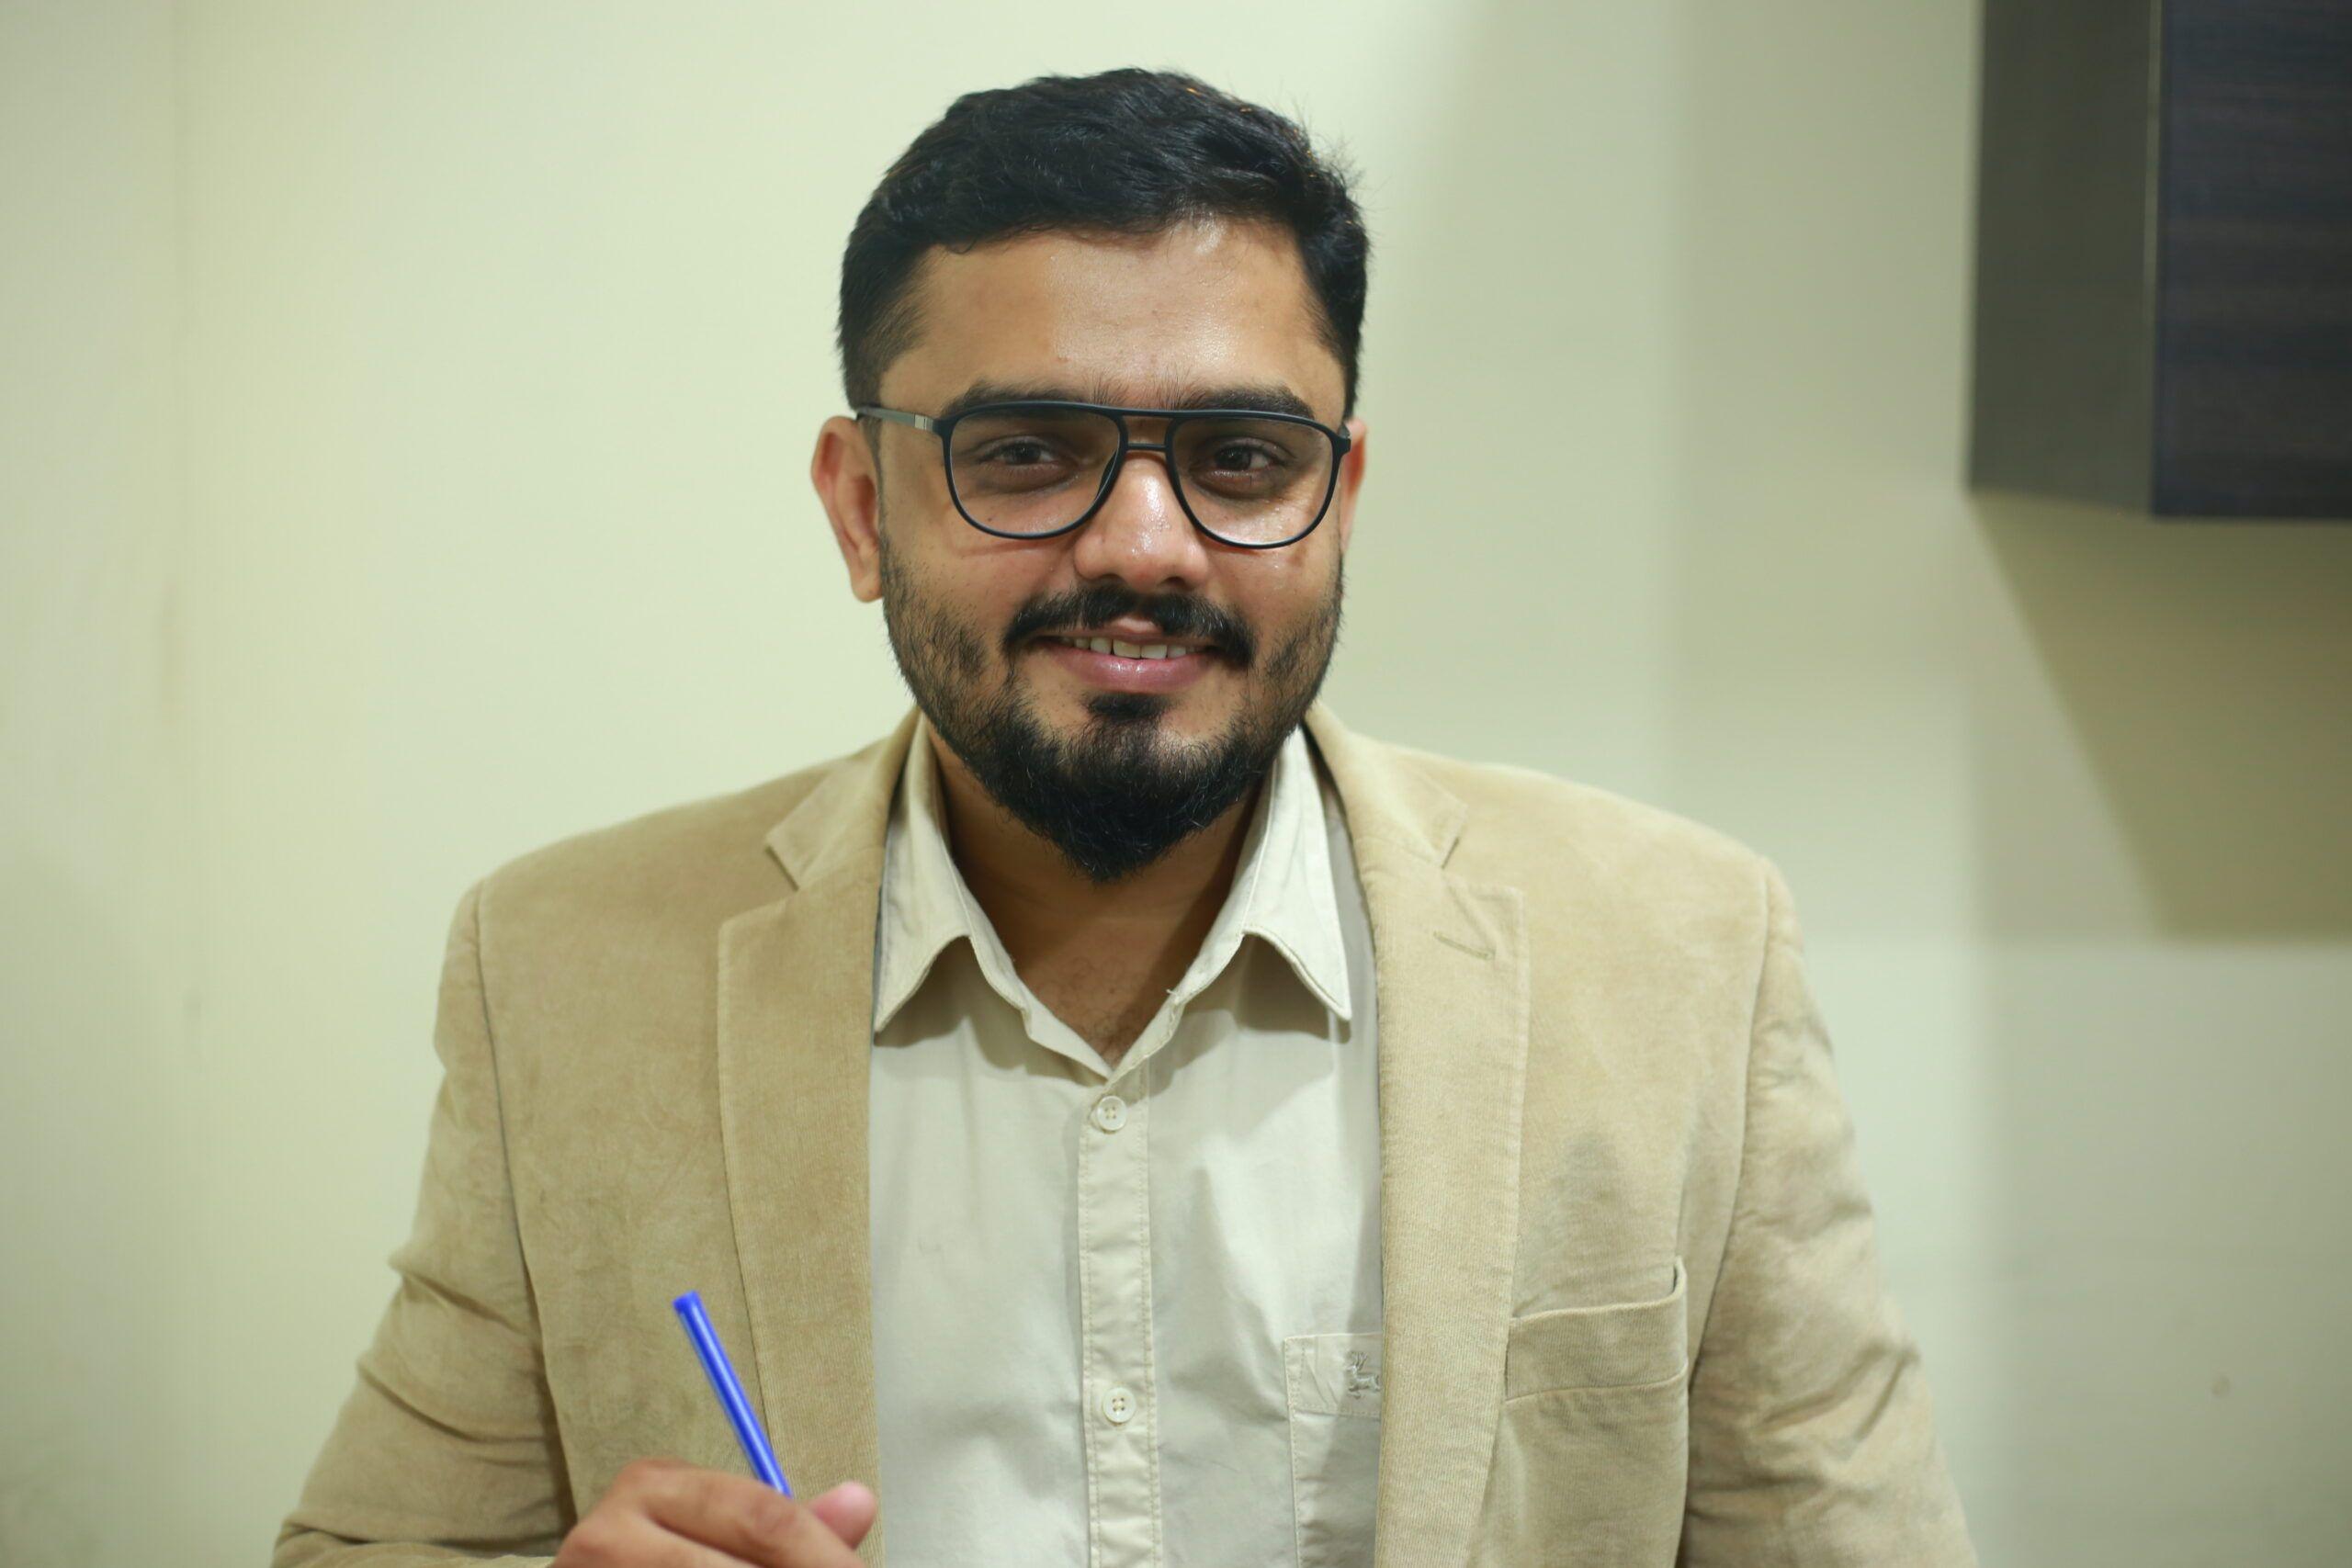 Ashraf Pullambalavan